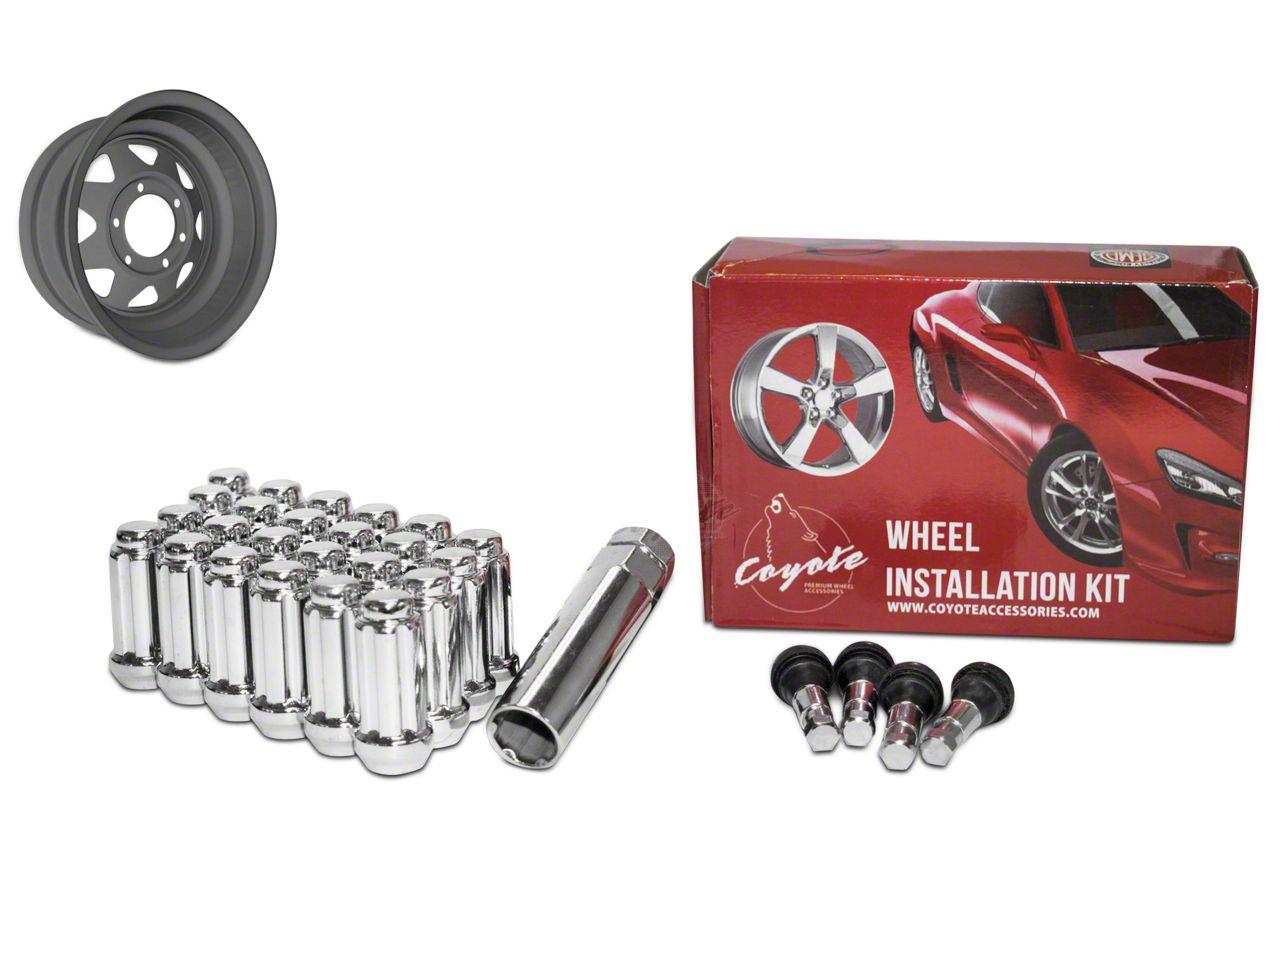 Coyote Chrome 6 Spline Lug Nut Kit - 14mm x 1.50 in. (07-18 Sierra 1500)